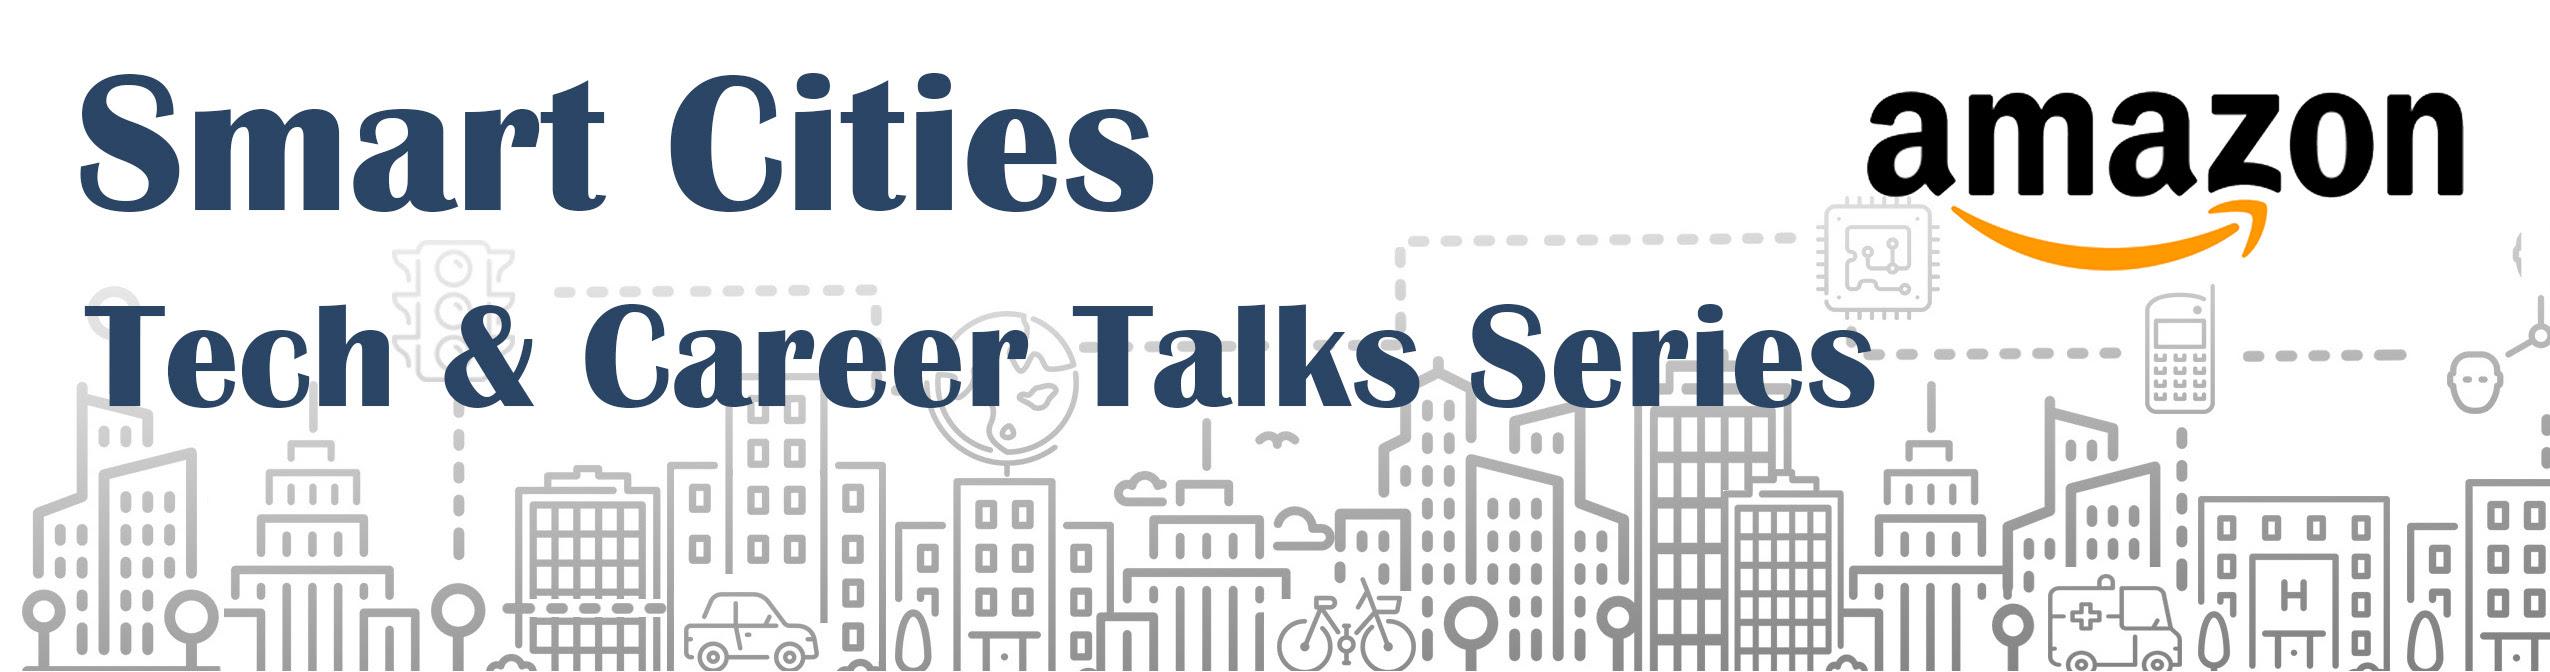 Smart Cities Tech and Career Talks - Amazon